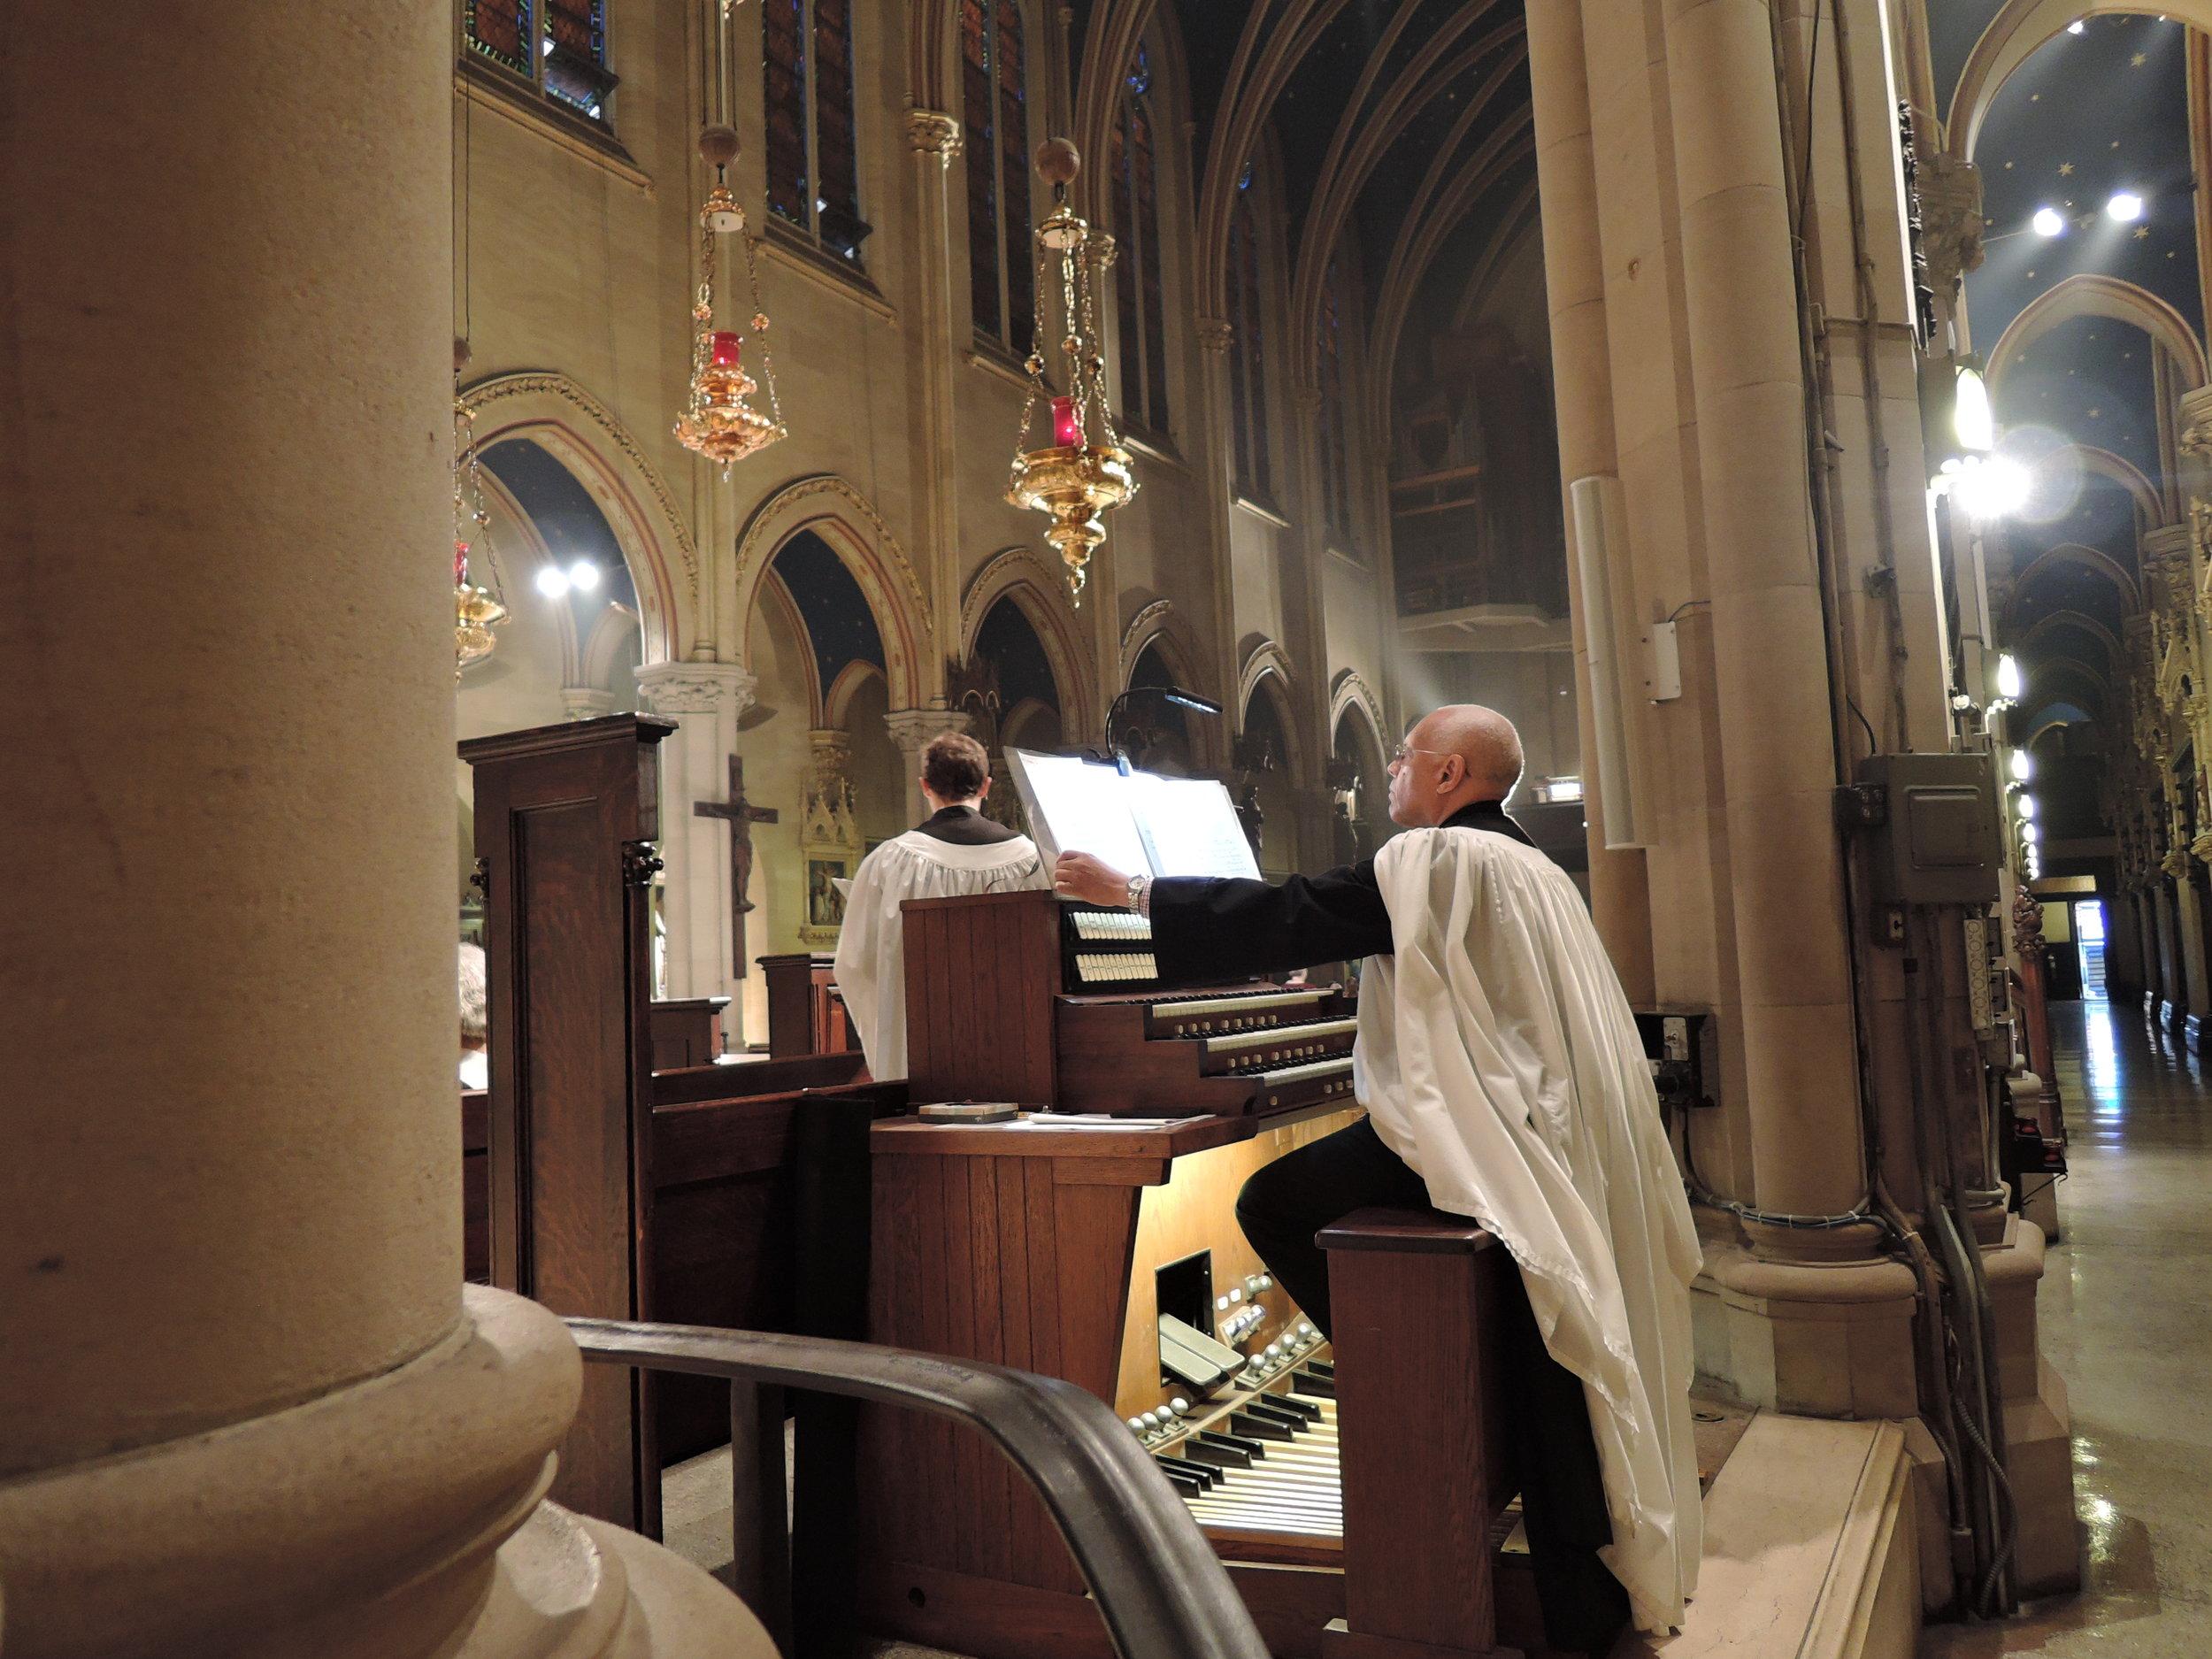 Dr. David Hurd at the chancel organ console.